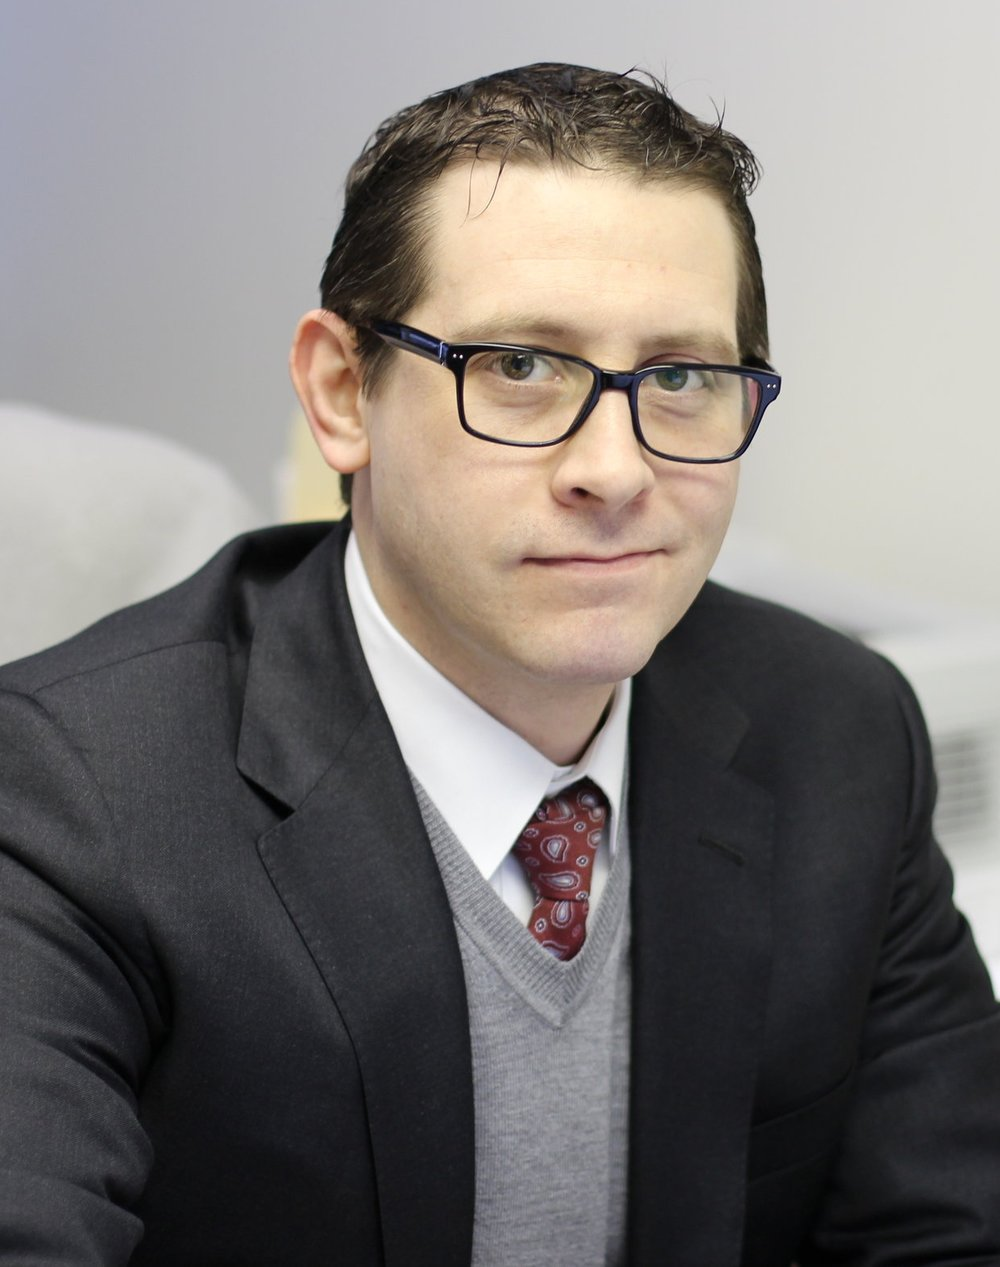 James J. Rufo